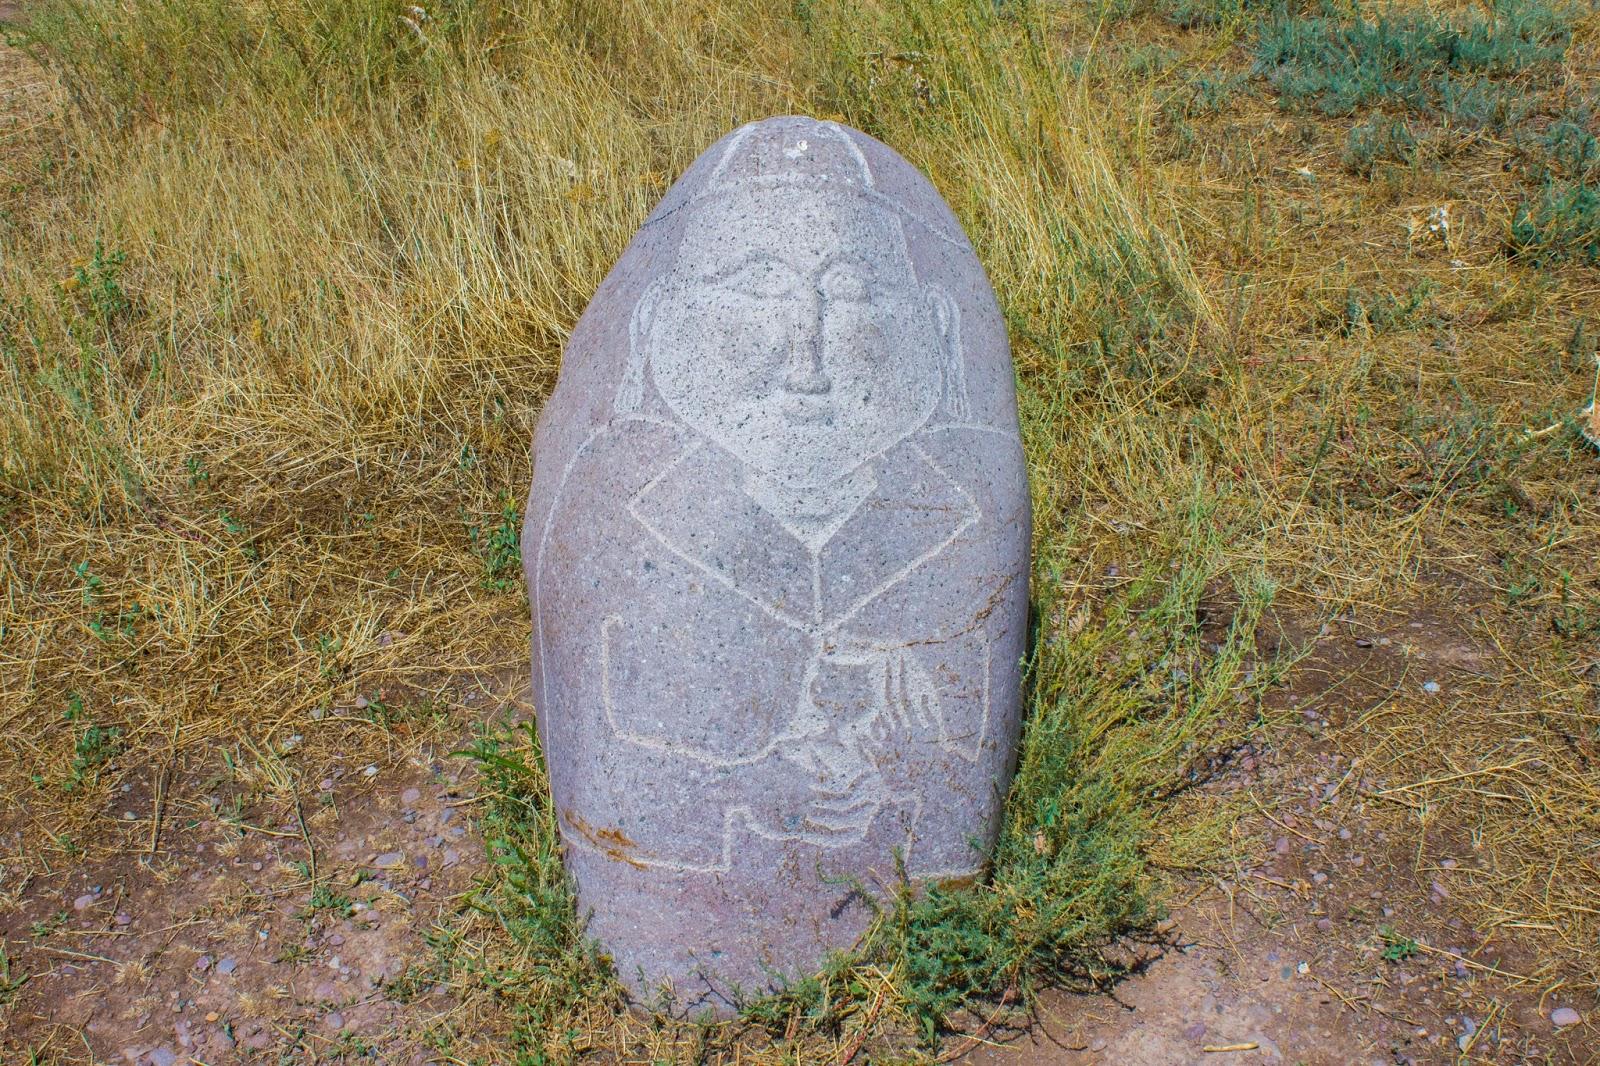 Кыргызстан, Бурана, каменное изваяние, могильник